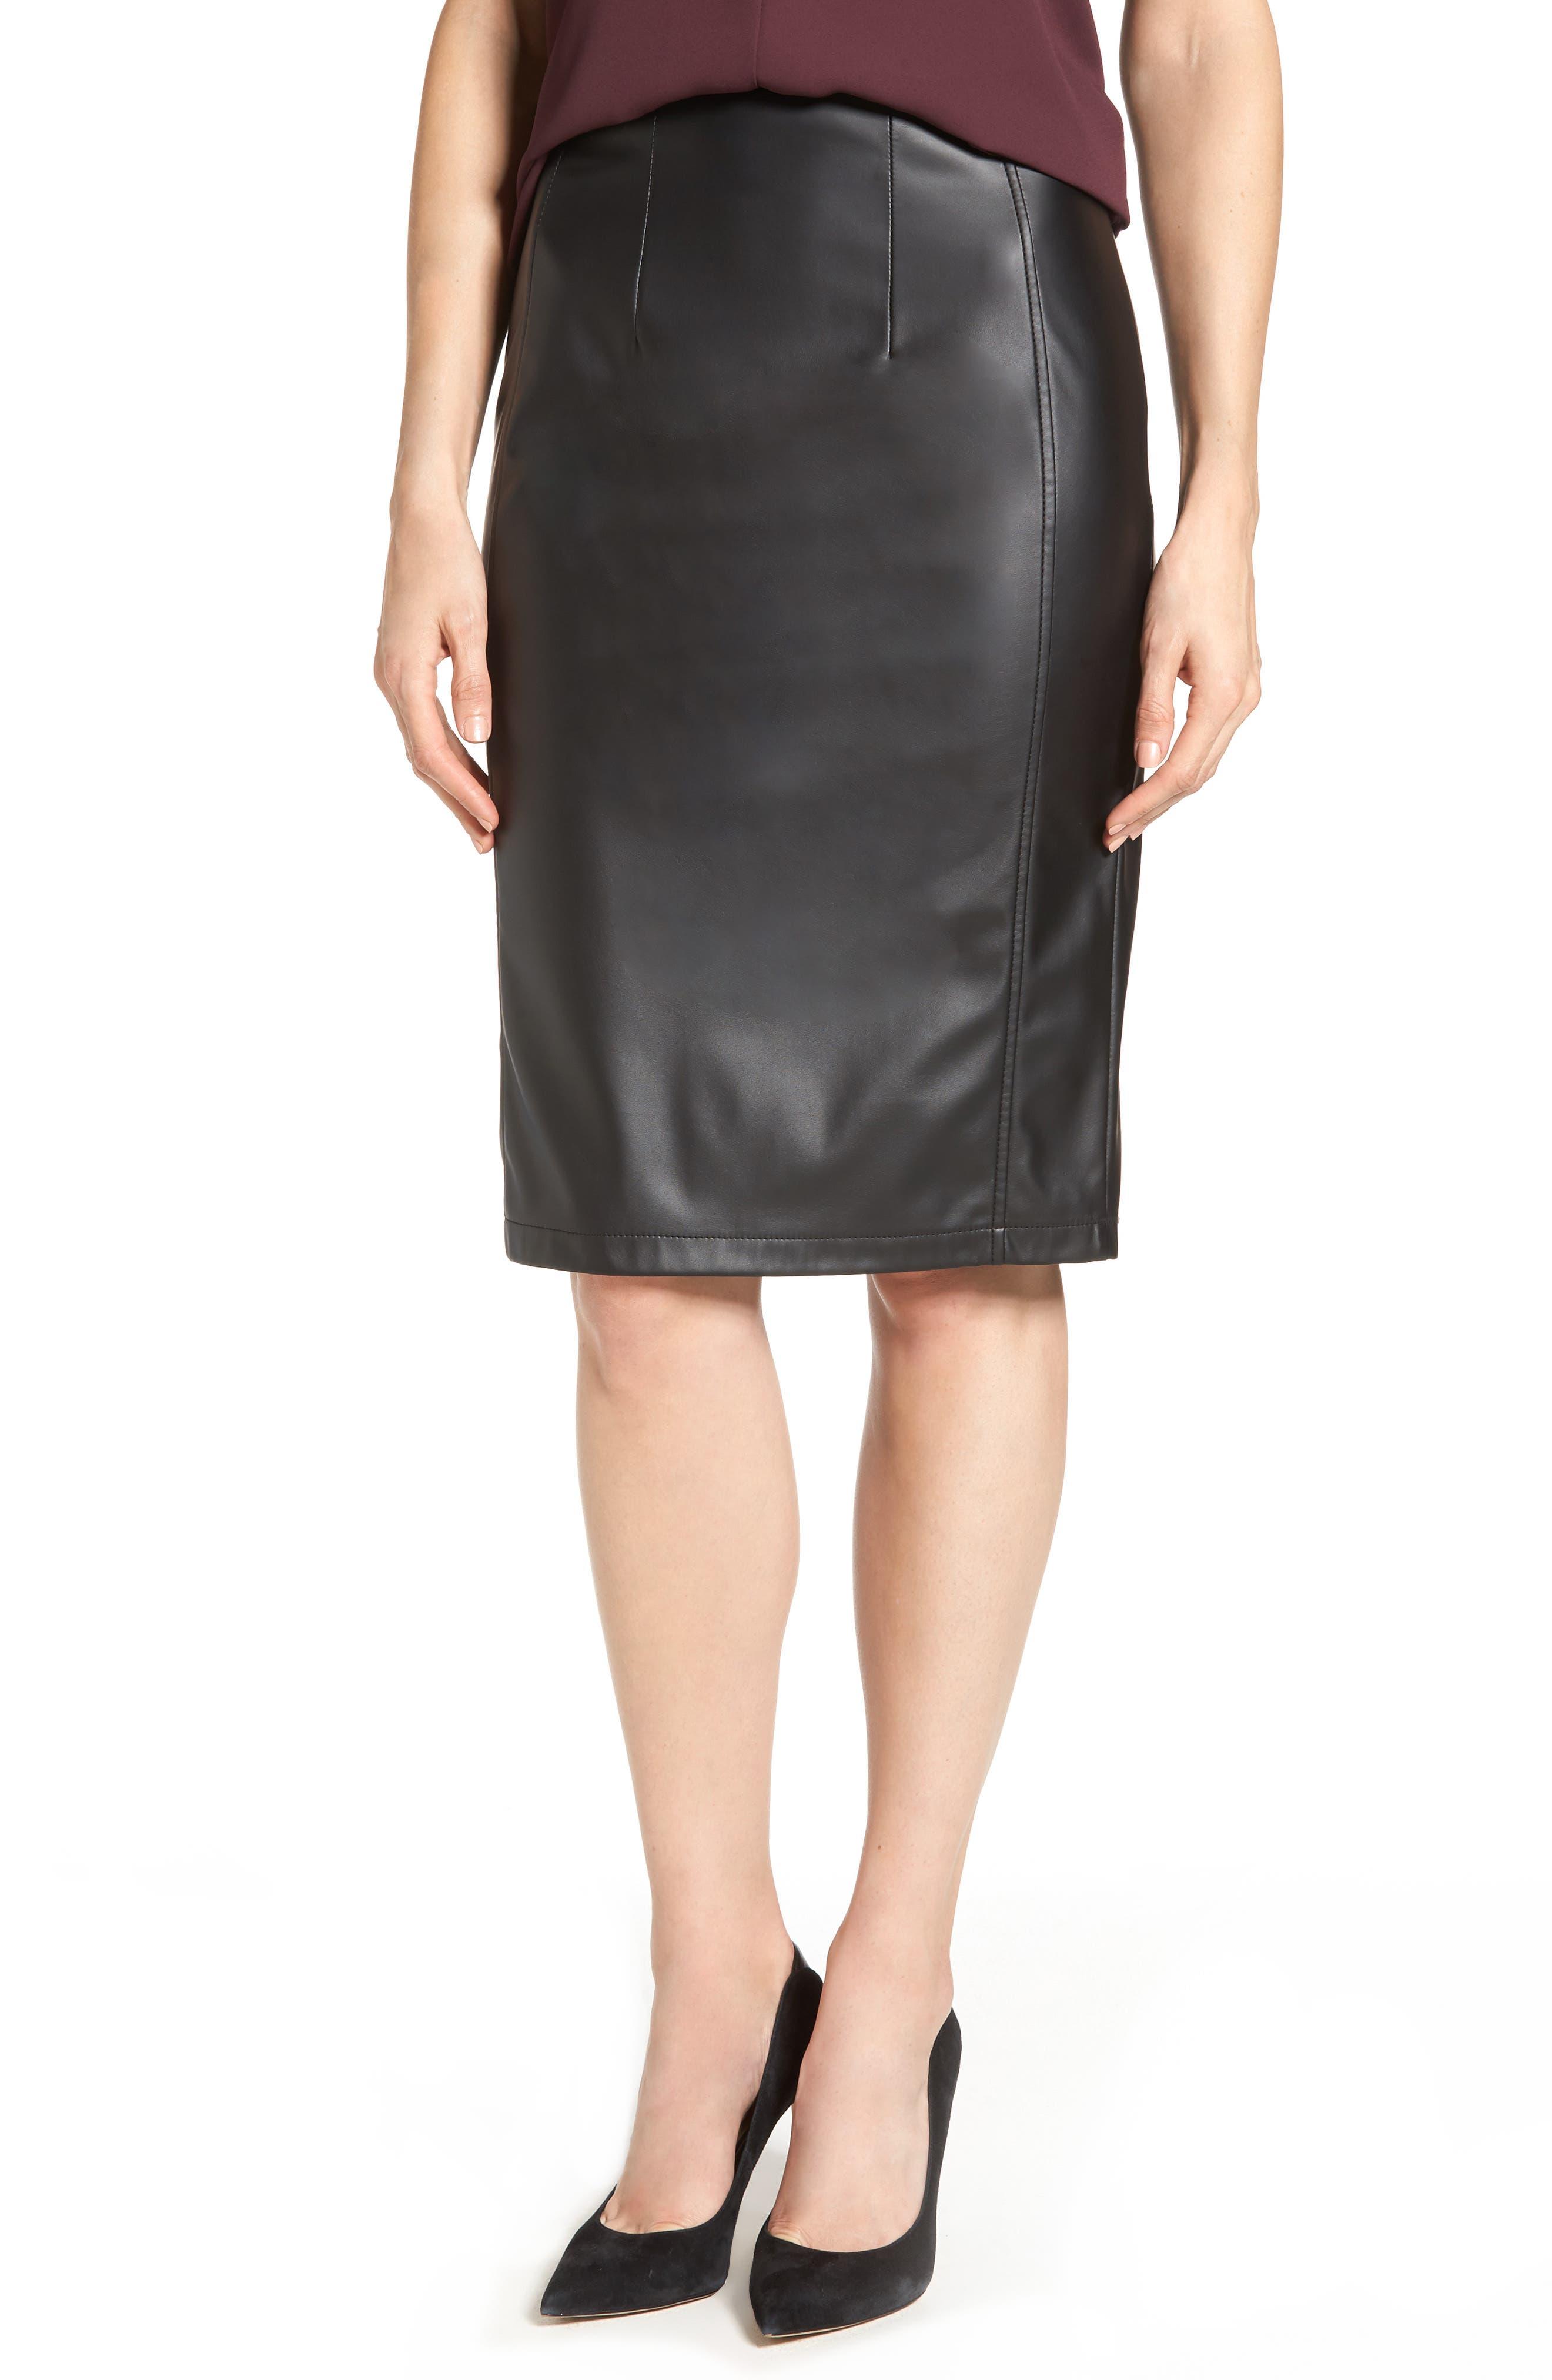 Alternate Image 1 Selected - Halogen® Faux Leather Pencil Skirt (Regular & Petite)